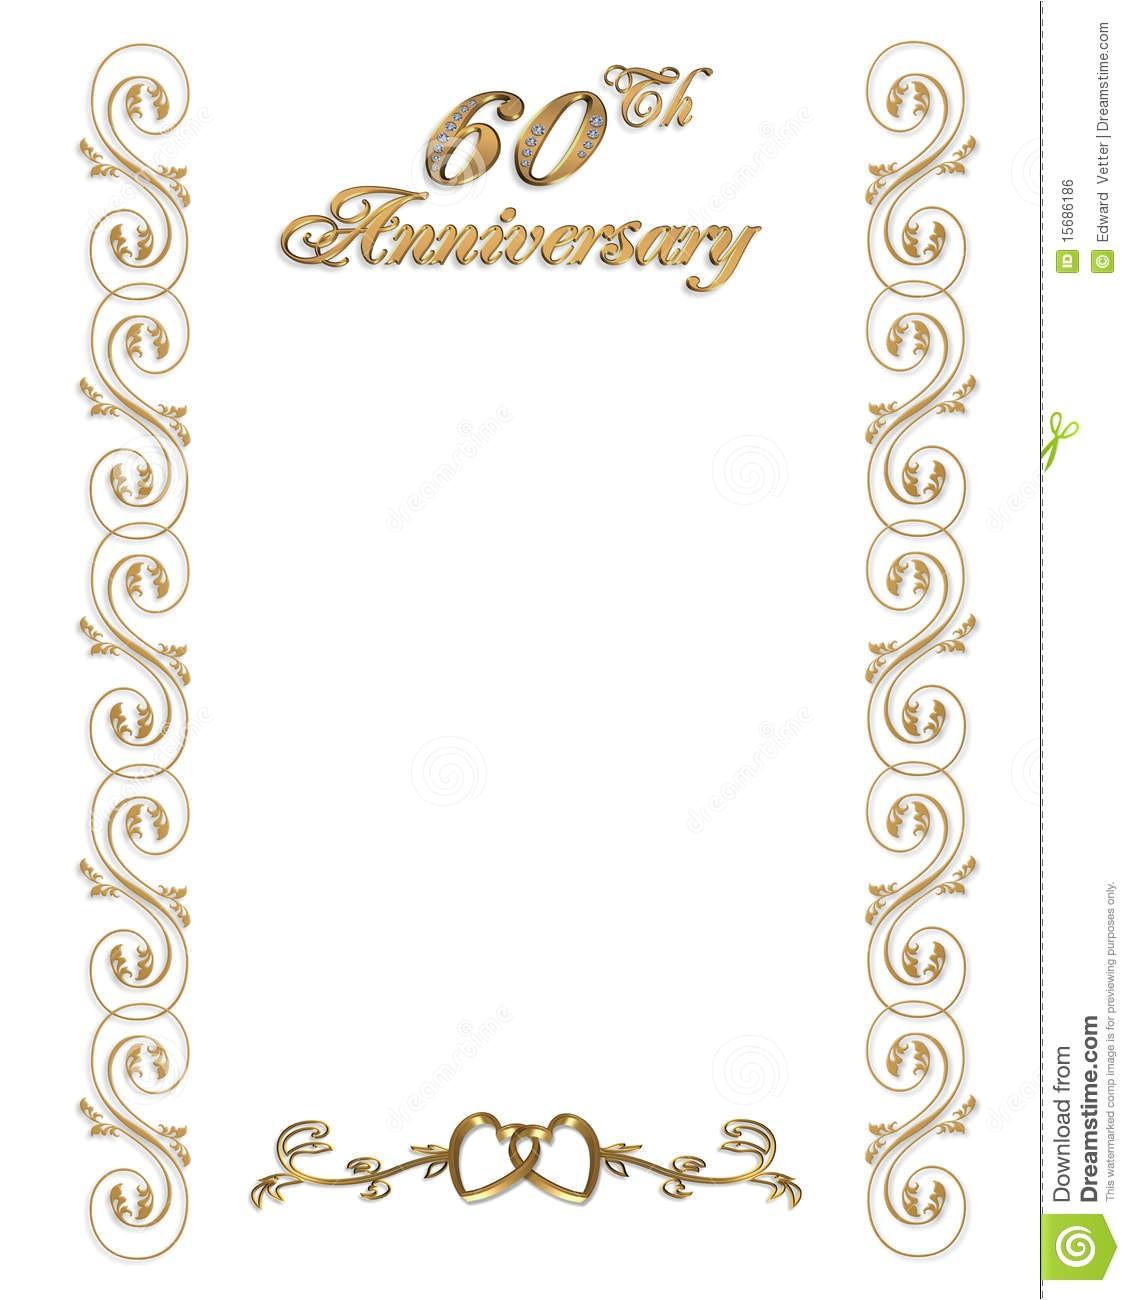 60th wedding anniversary invitations template